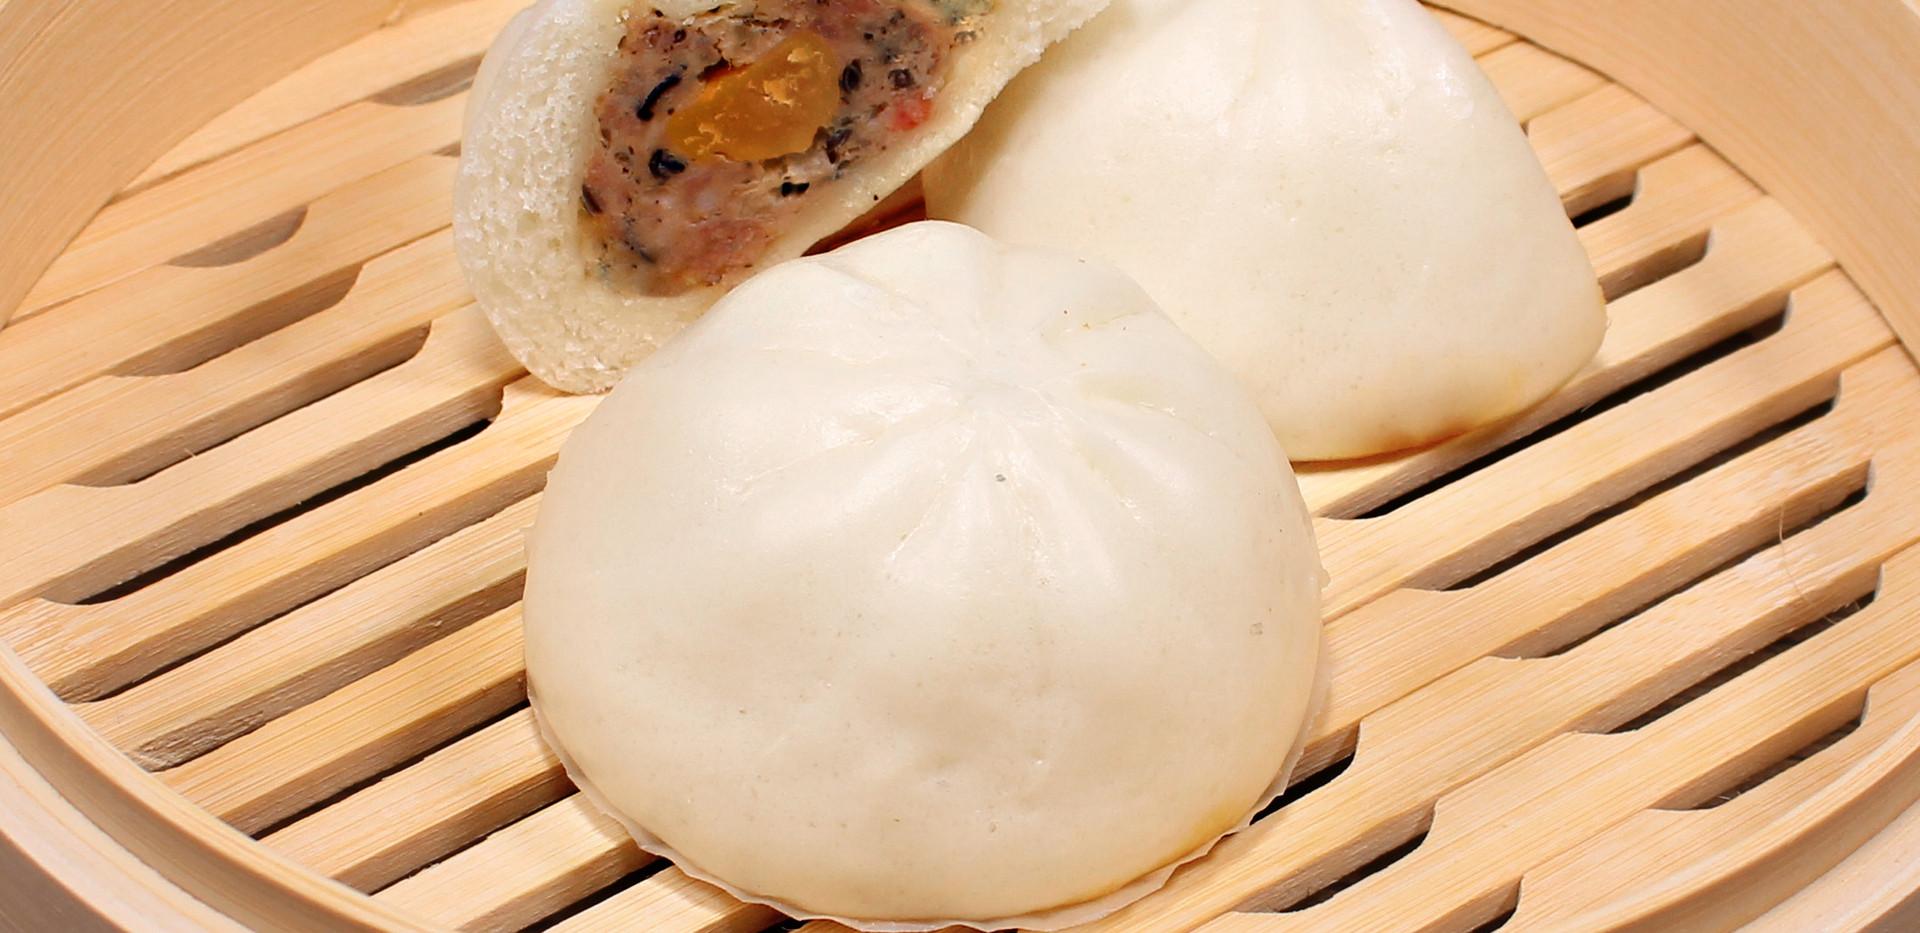 Quail Egg & Pork Bao - Bánh Bao Thịt Heo Trứng Cút